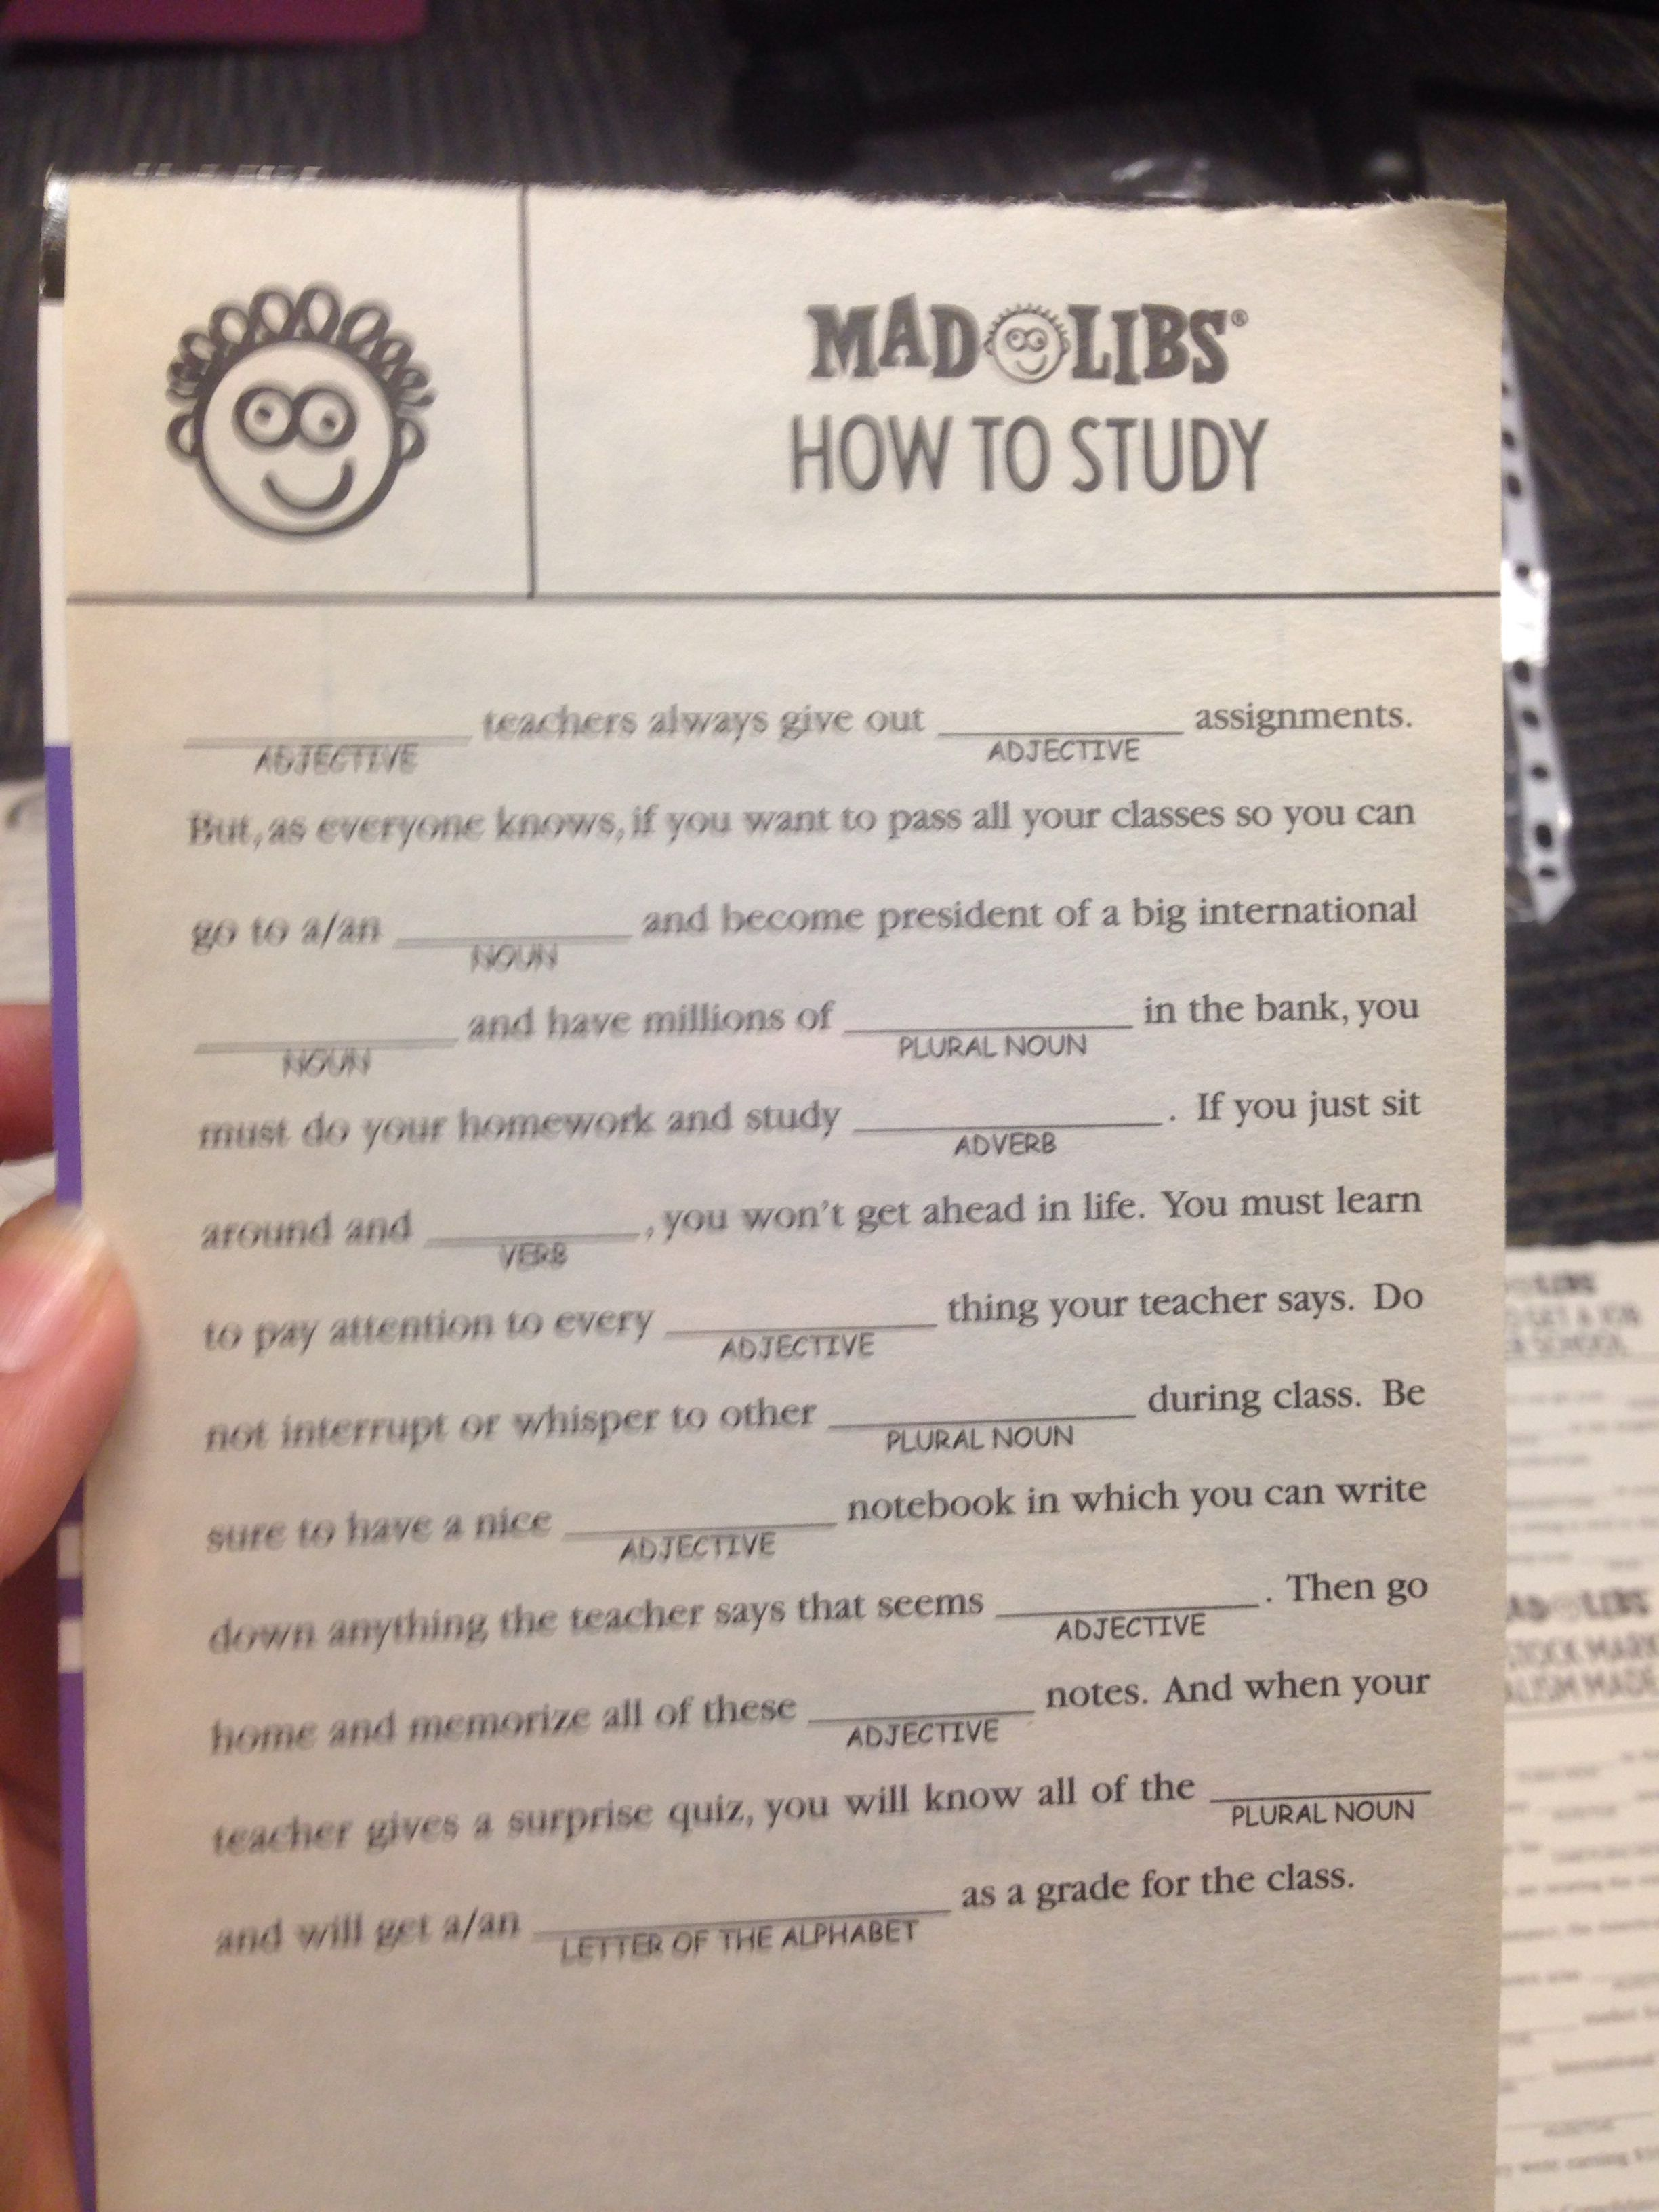 Mad libs teacher resources teaching language arts teaching